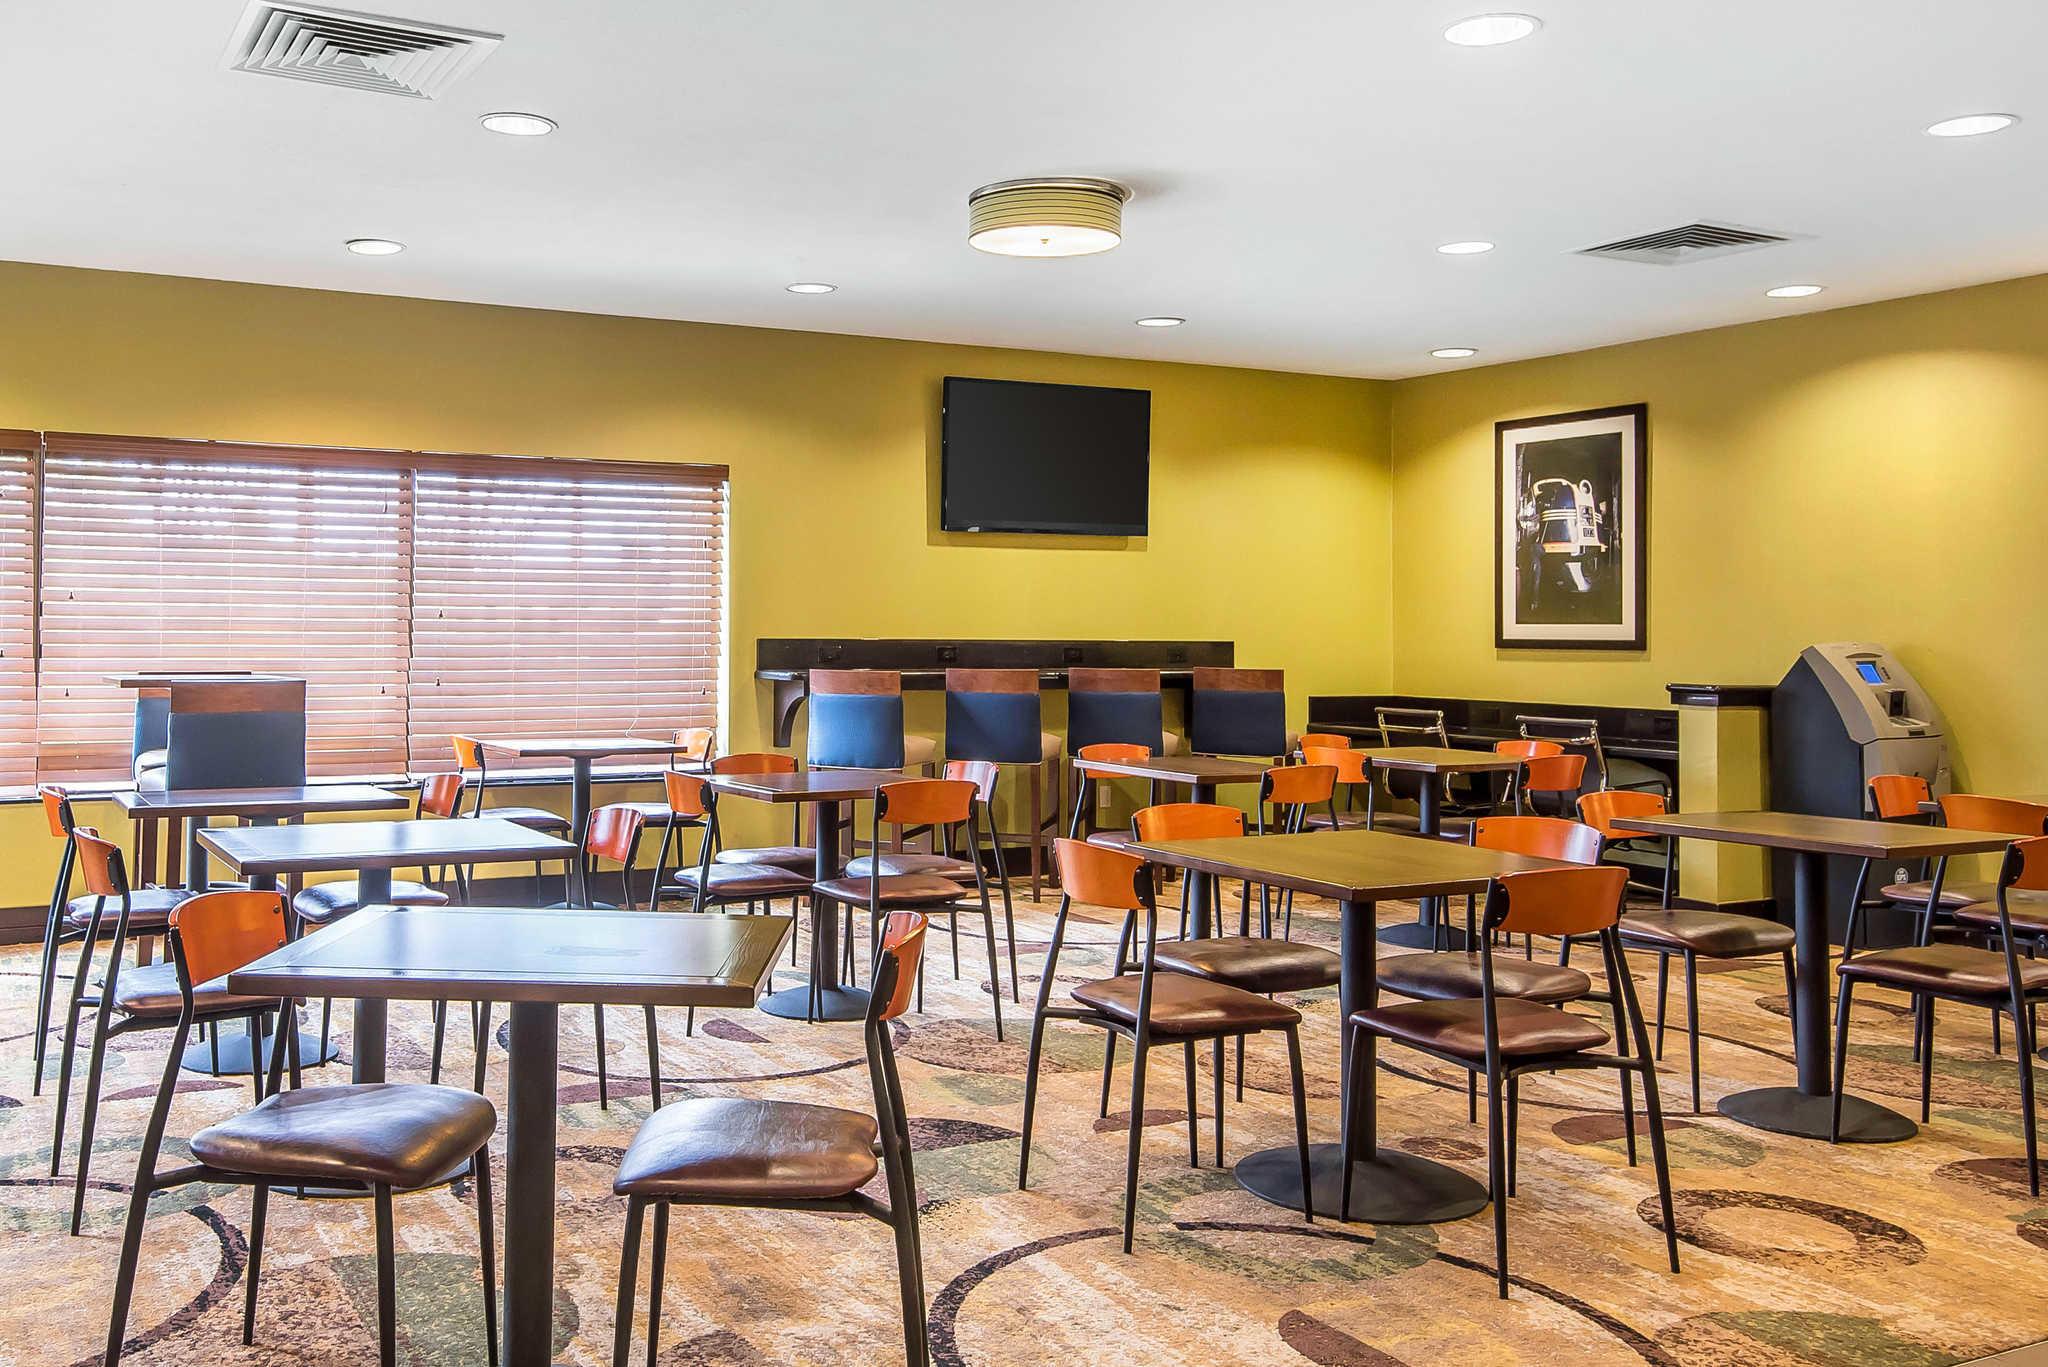 Comfort Inn & Suites Kansas City - Northeast image 26